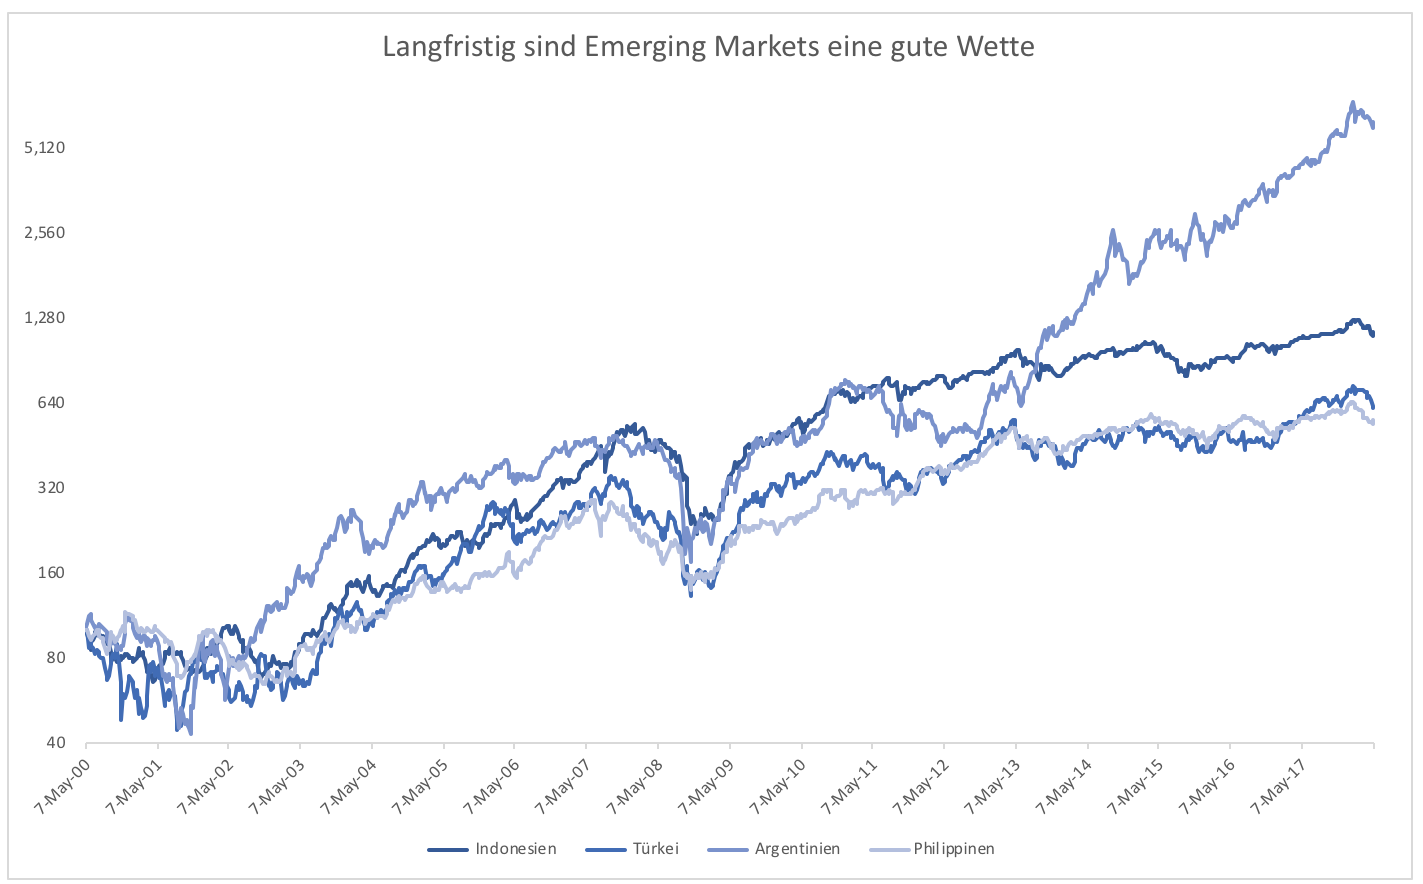 Emerging-Markets-Ausbruch-oder-Zusammenbruch-Kommentar-Clemens-Schmale-GodmodeTrader.de-2